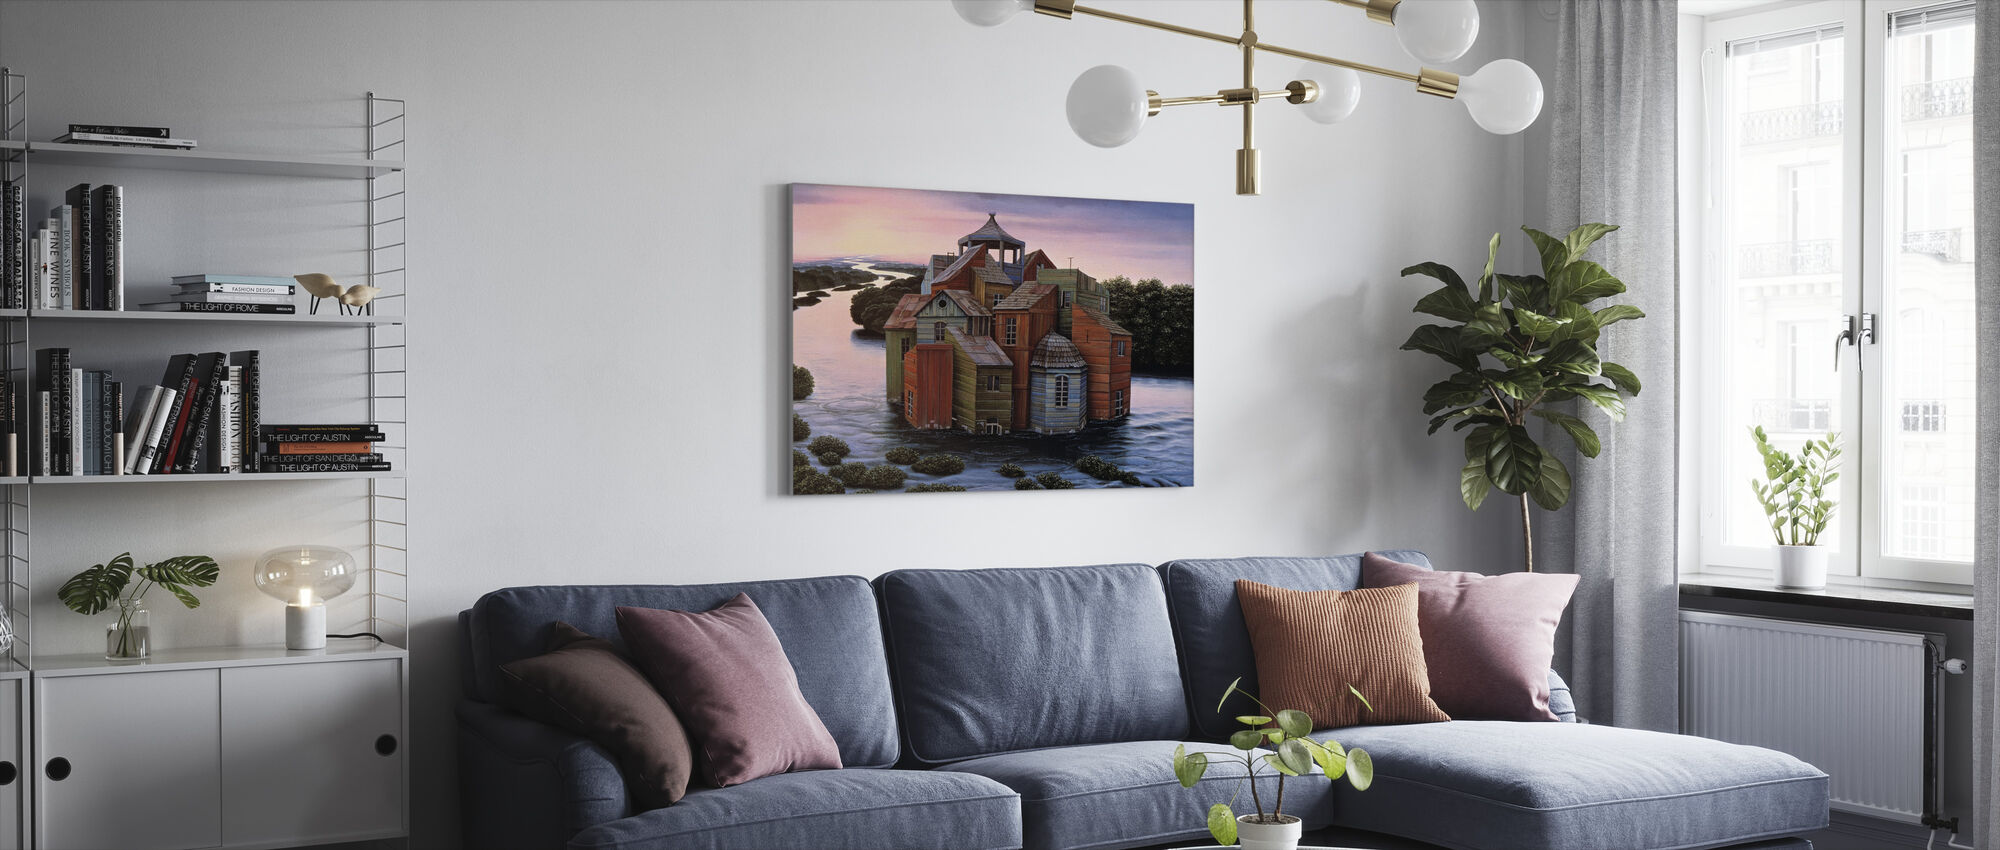 Fallingwater Estate - Canvastavla - Vardagsrum